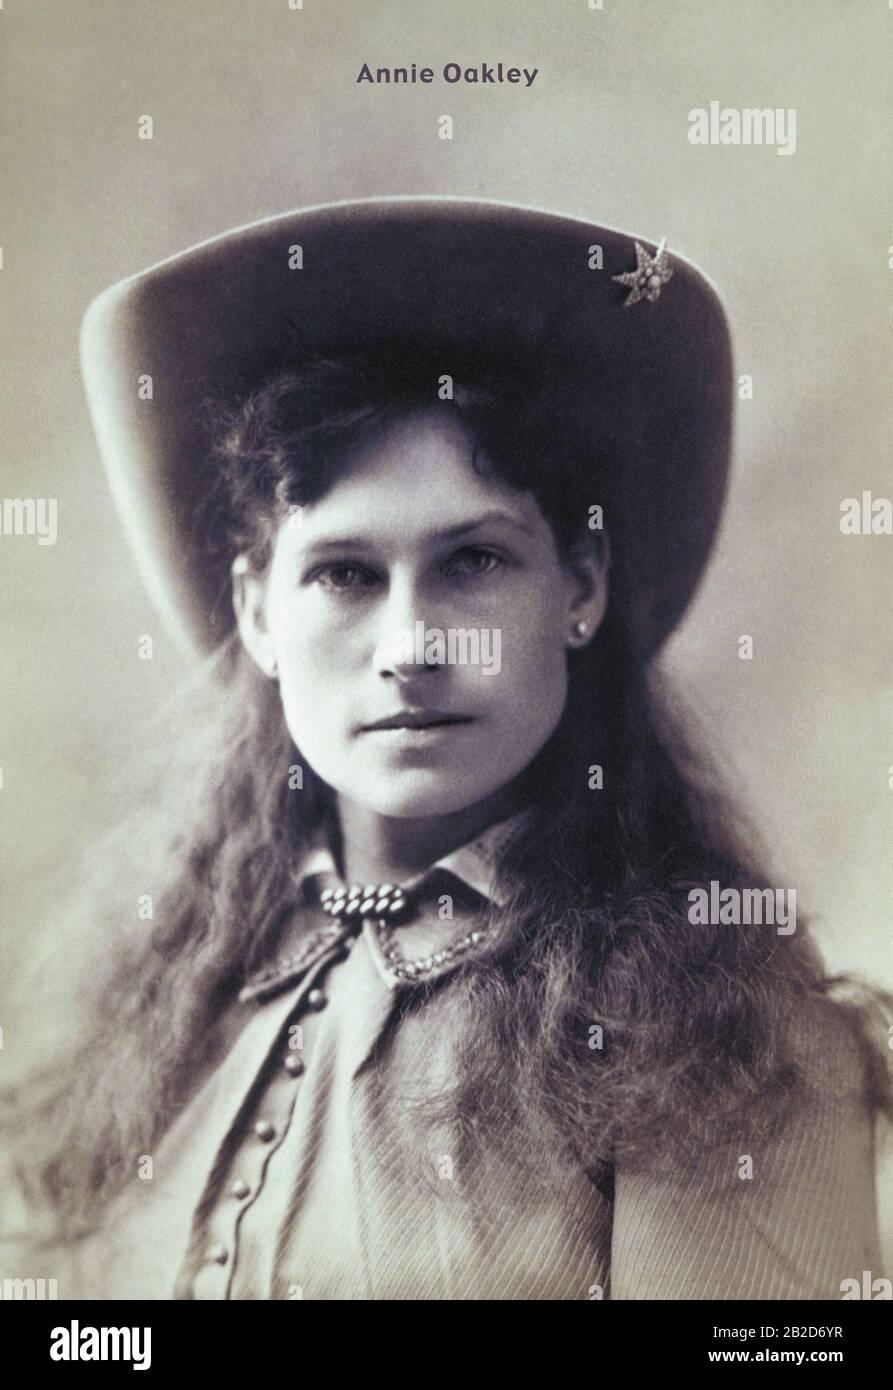 Annie Oakley Stock Photo